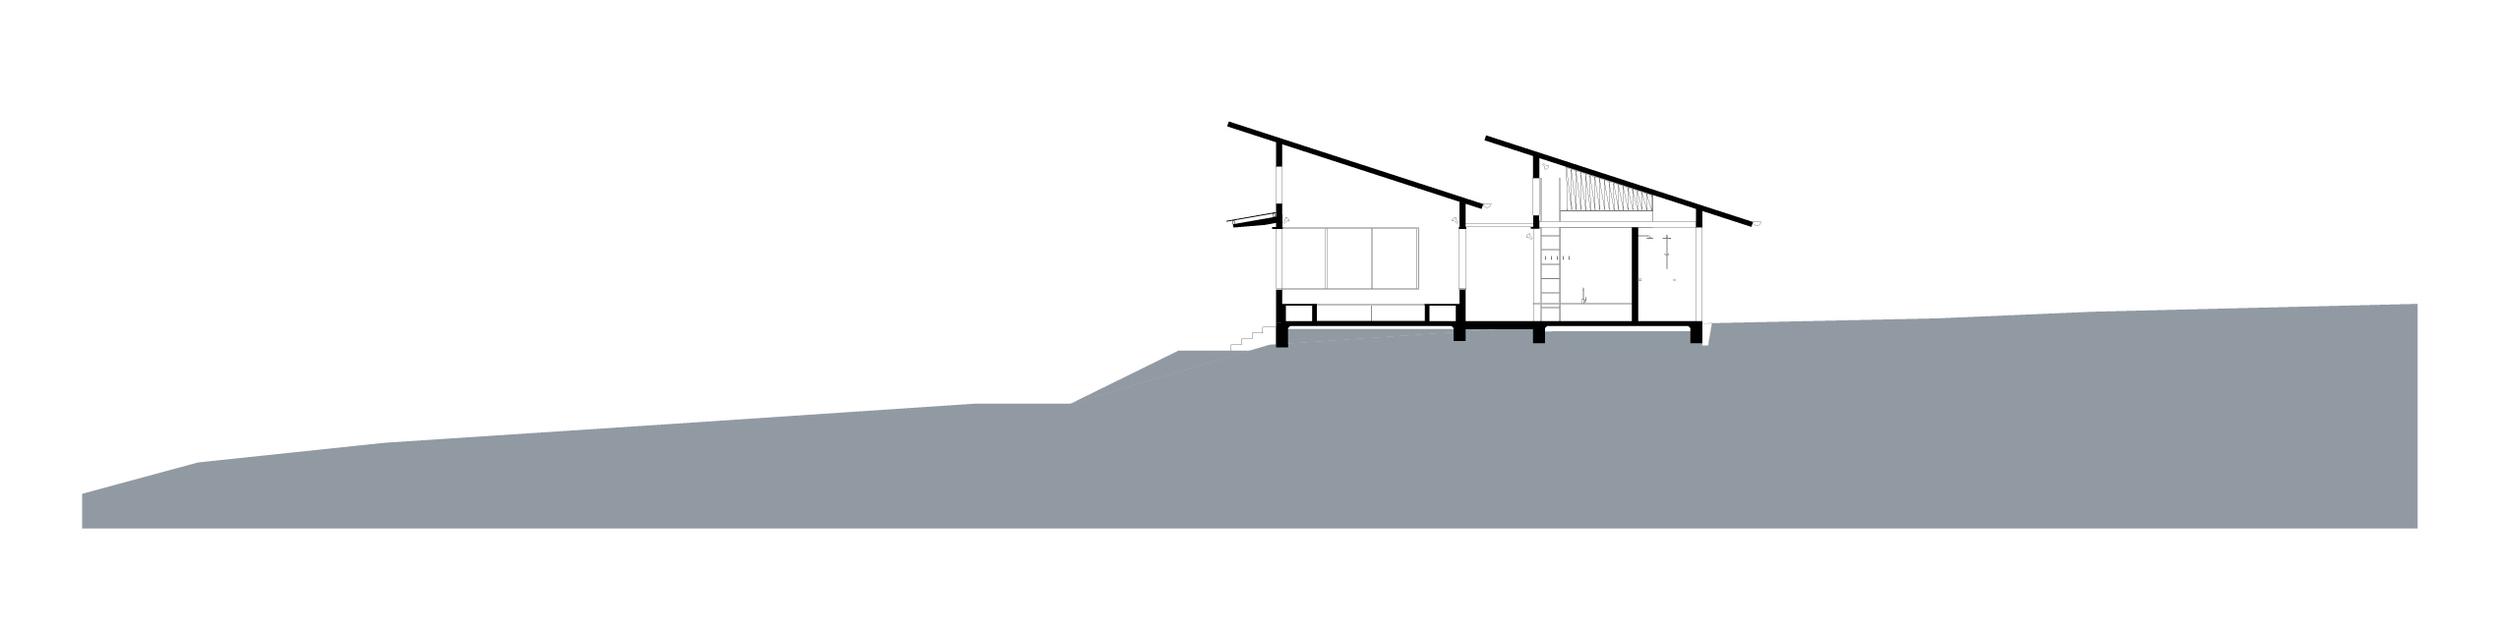 SLH Section-03.jpg